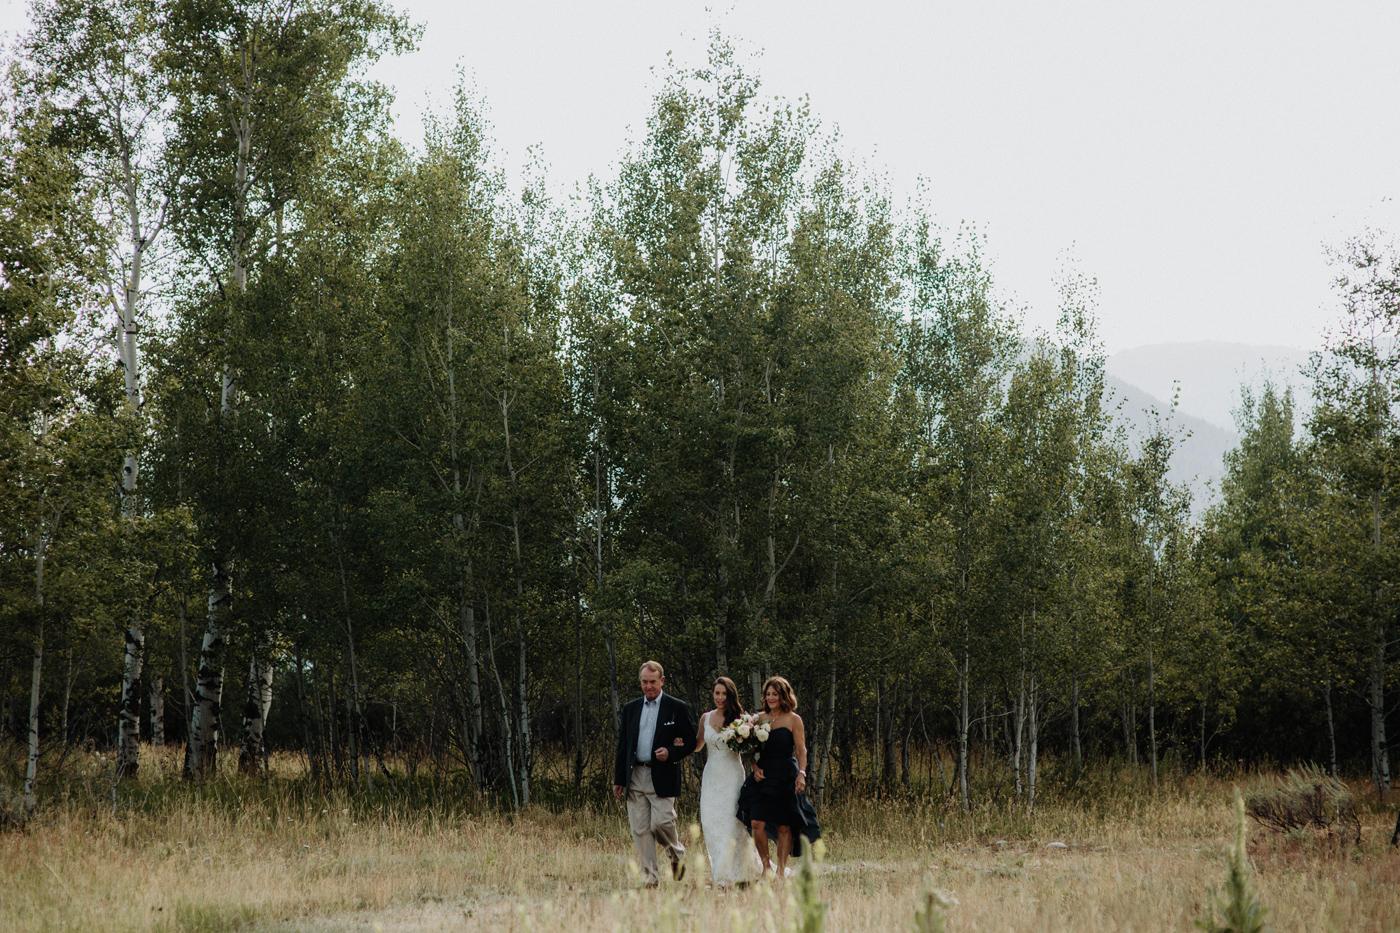 020-grand-teton-jackson-hole-wyoming-wedding.jpg